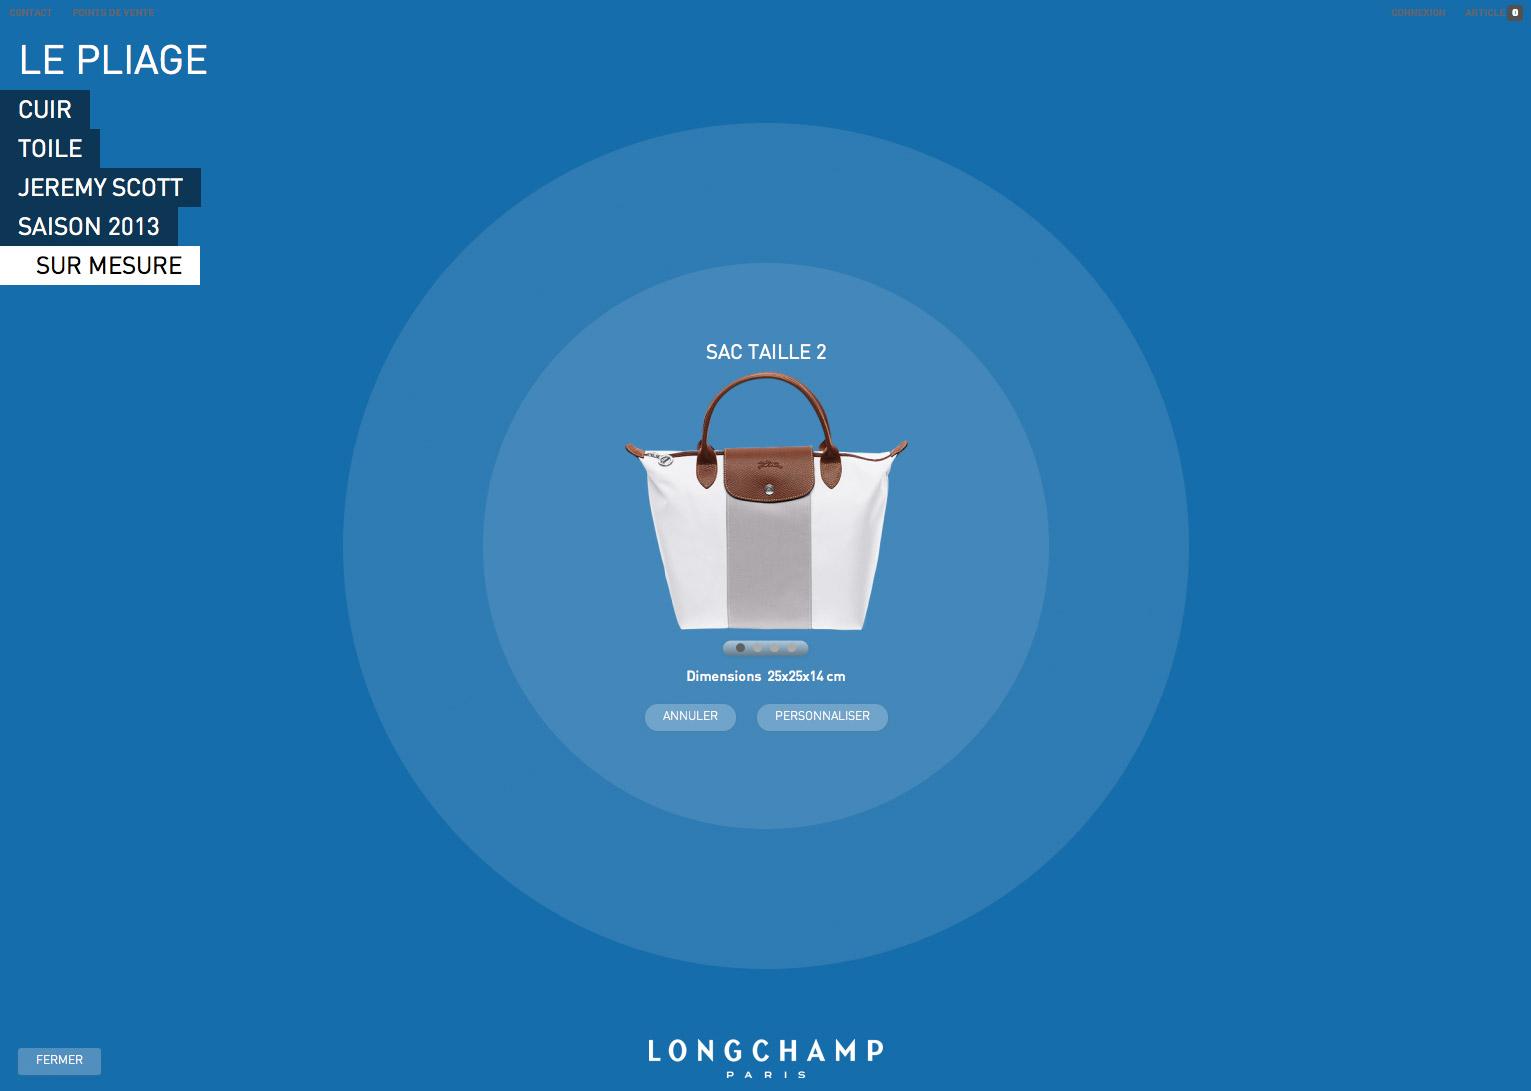 Sac Croquis Dimension Sac Croquis Dimension Longchamp Sac Dimension Sac Croquis Longchamp Longchamp Longchamp Dimension 1q0RXd